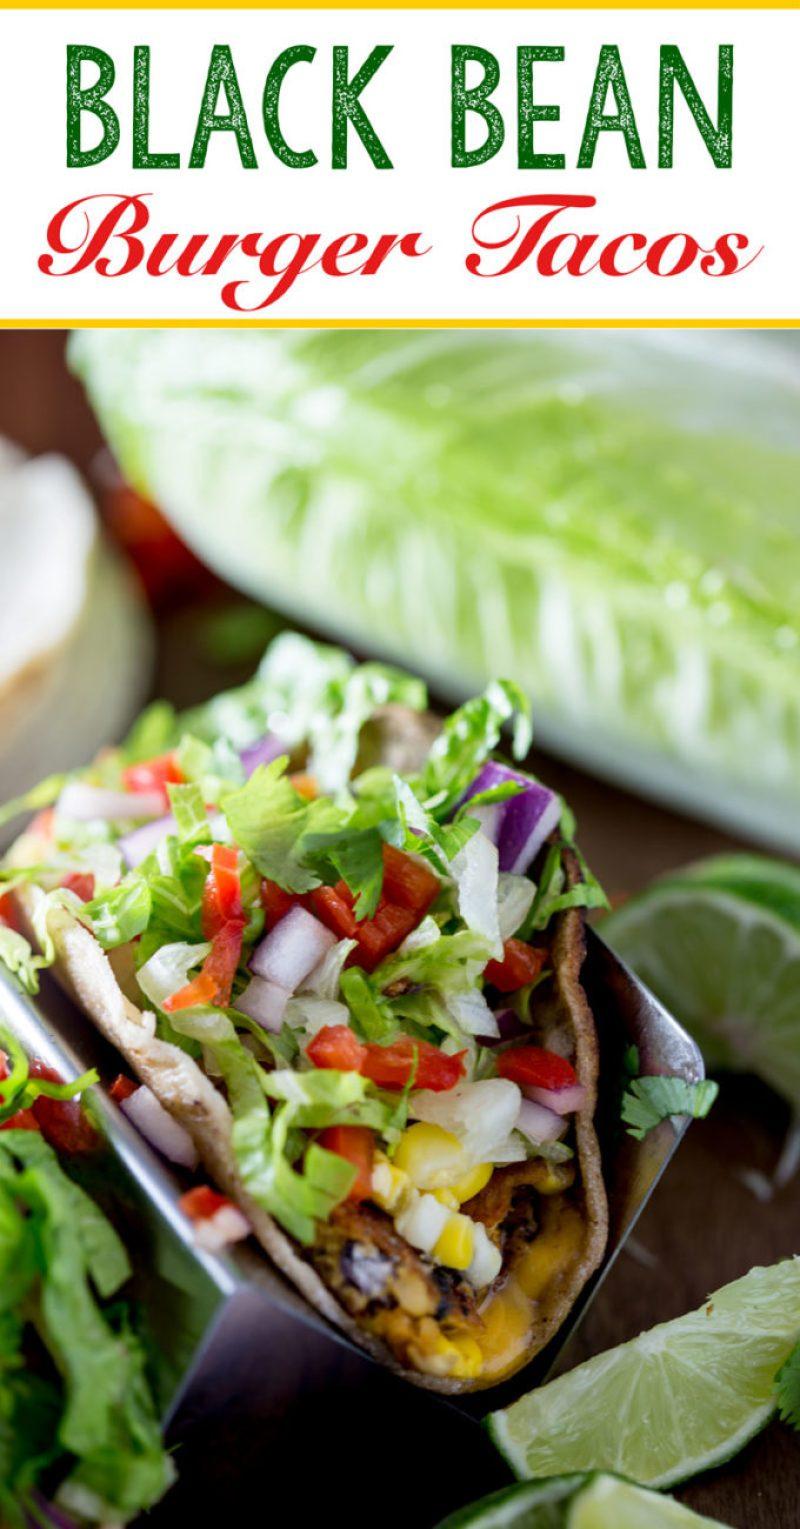 Black bean burger tacos a vegetarian weeknight meal